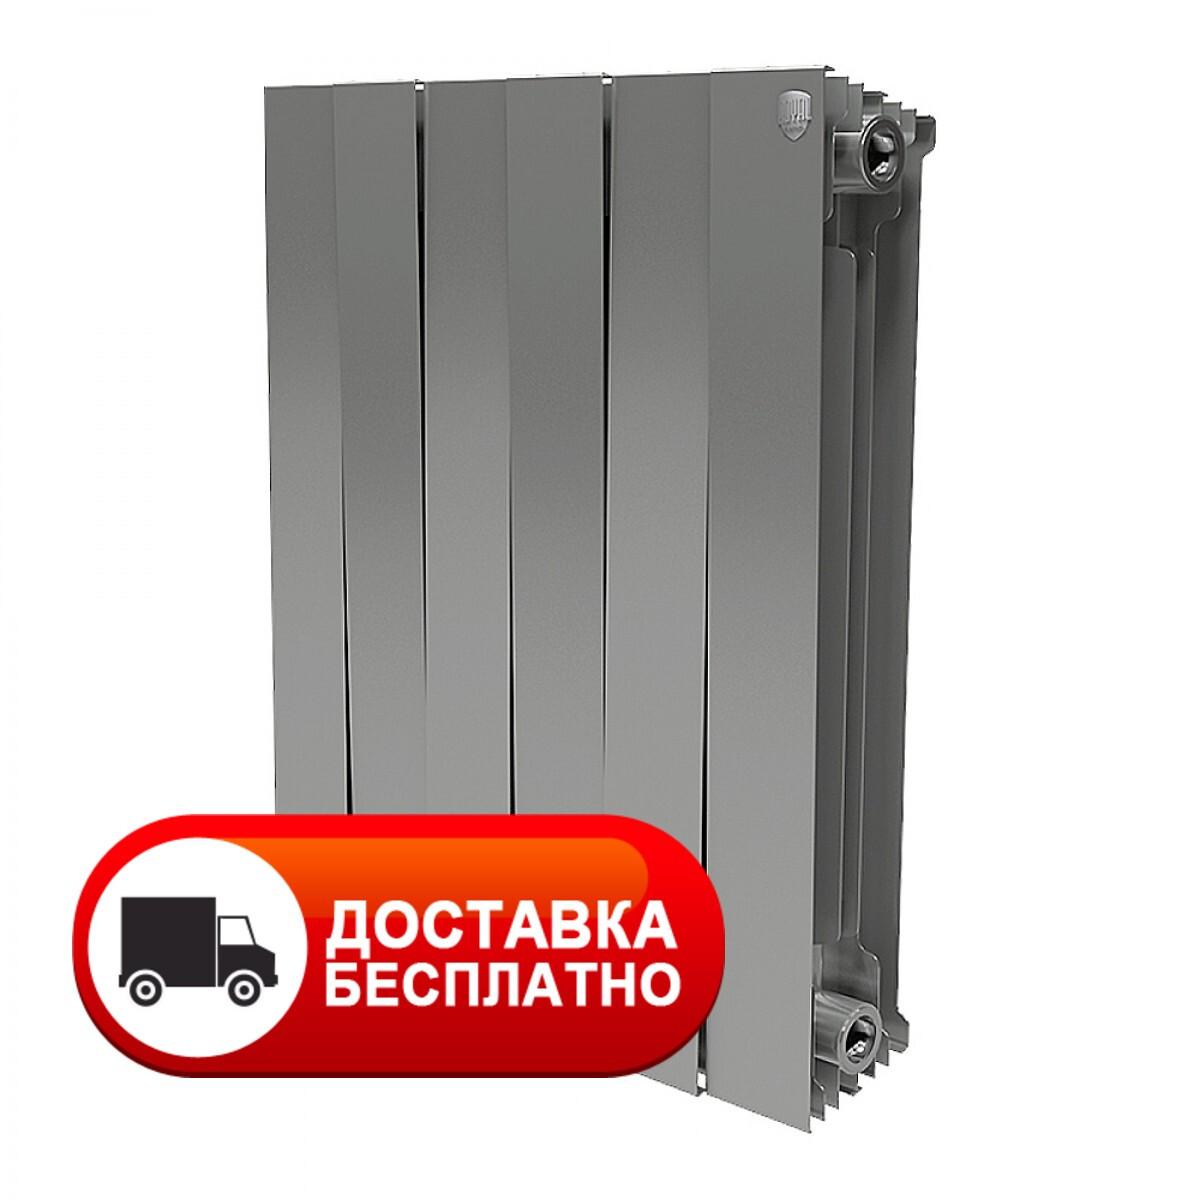 Радіатор біметал сірий Royal Thermo PianoForte 500/Silver Satin 6 секцій